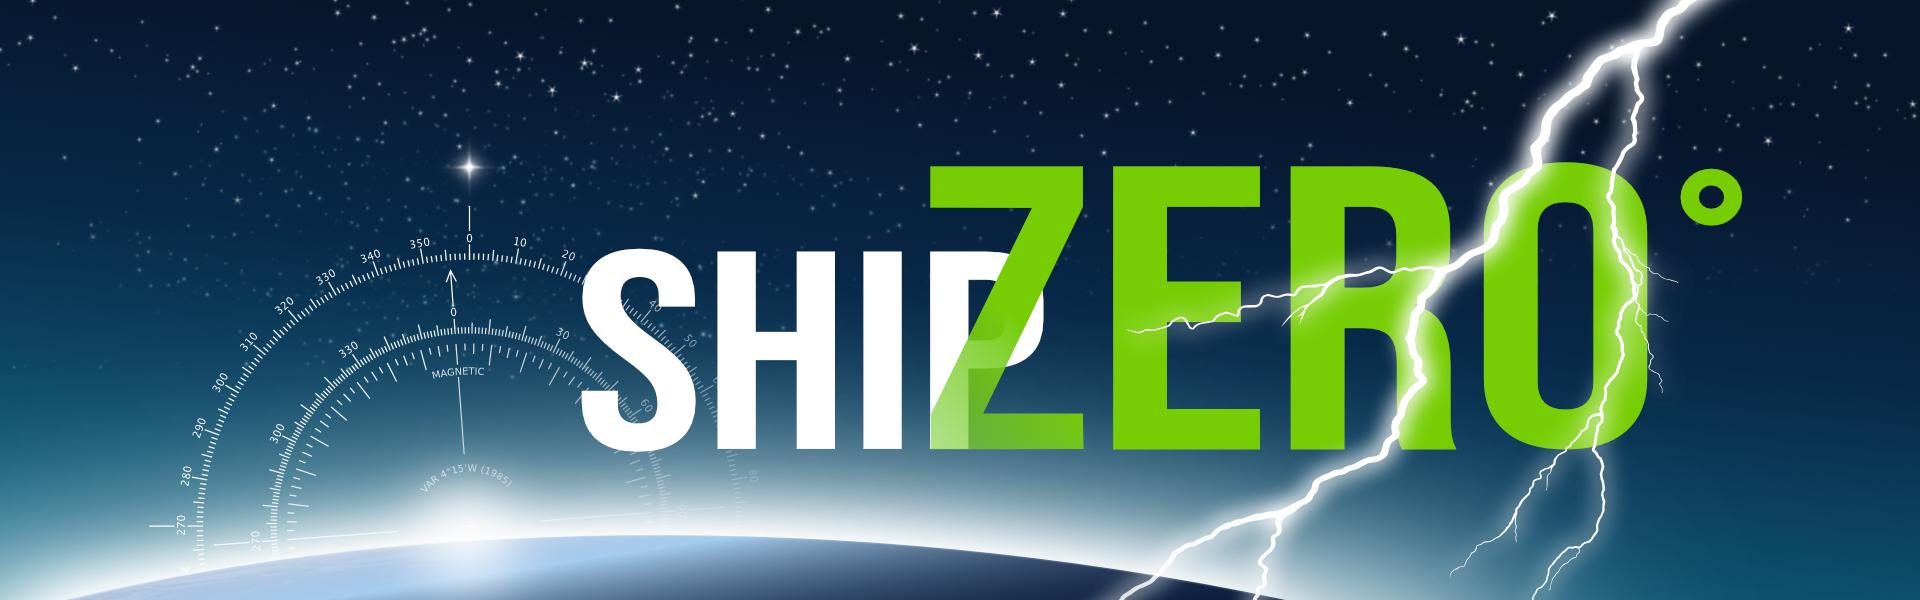 ShipZero